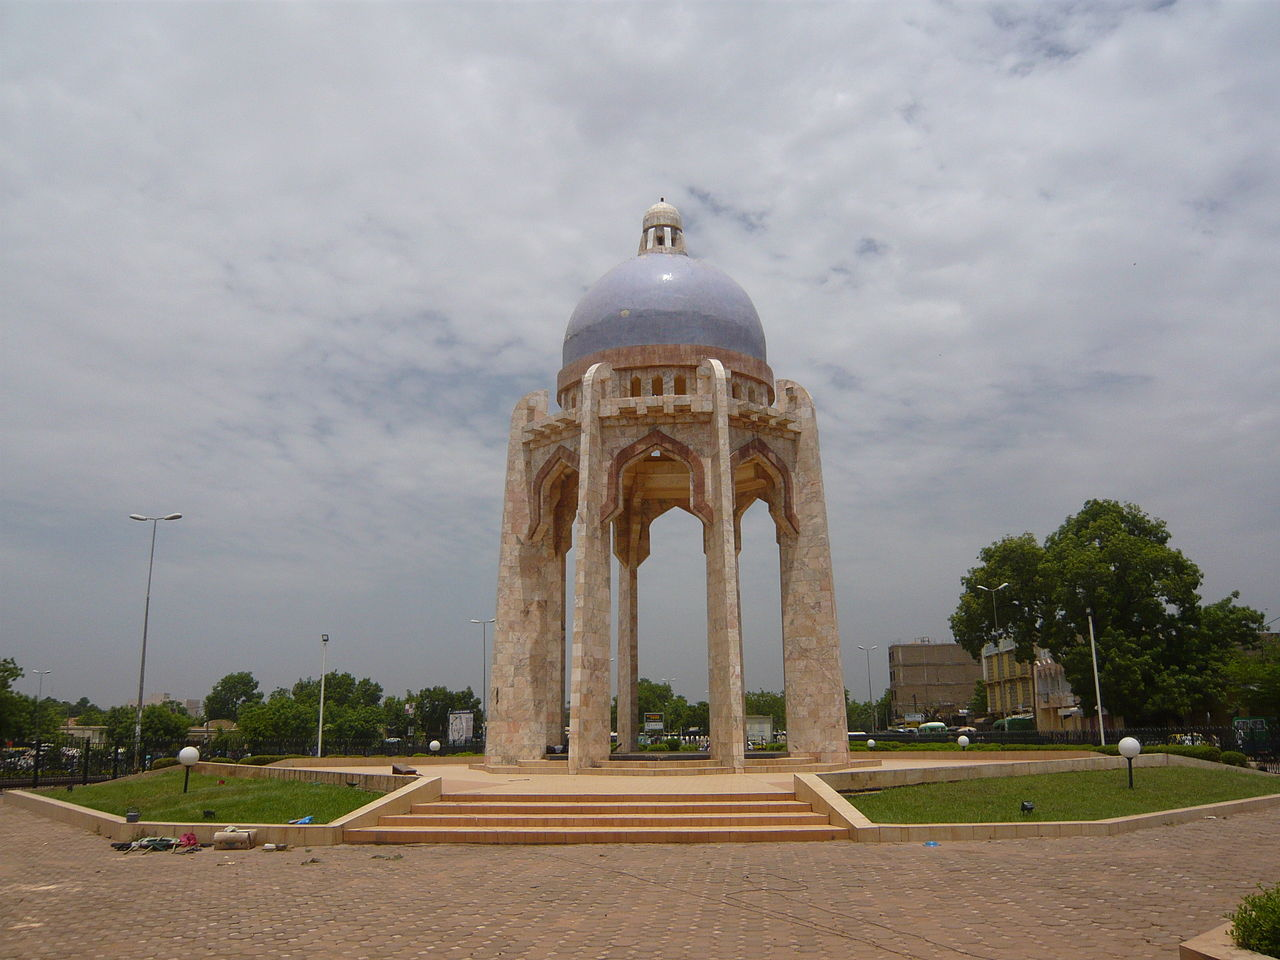 Anschlag auf das Radisson Blu Hotel in Bamako, Mali 1280px-Monument_Al_Quoods_-_Bamako